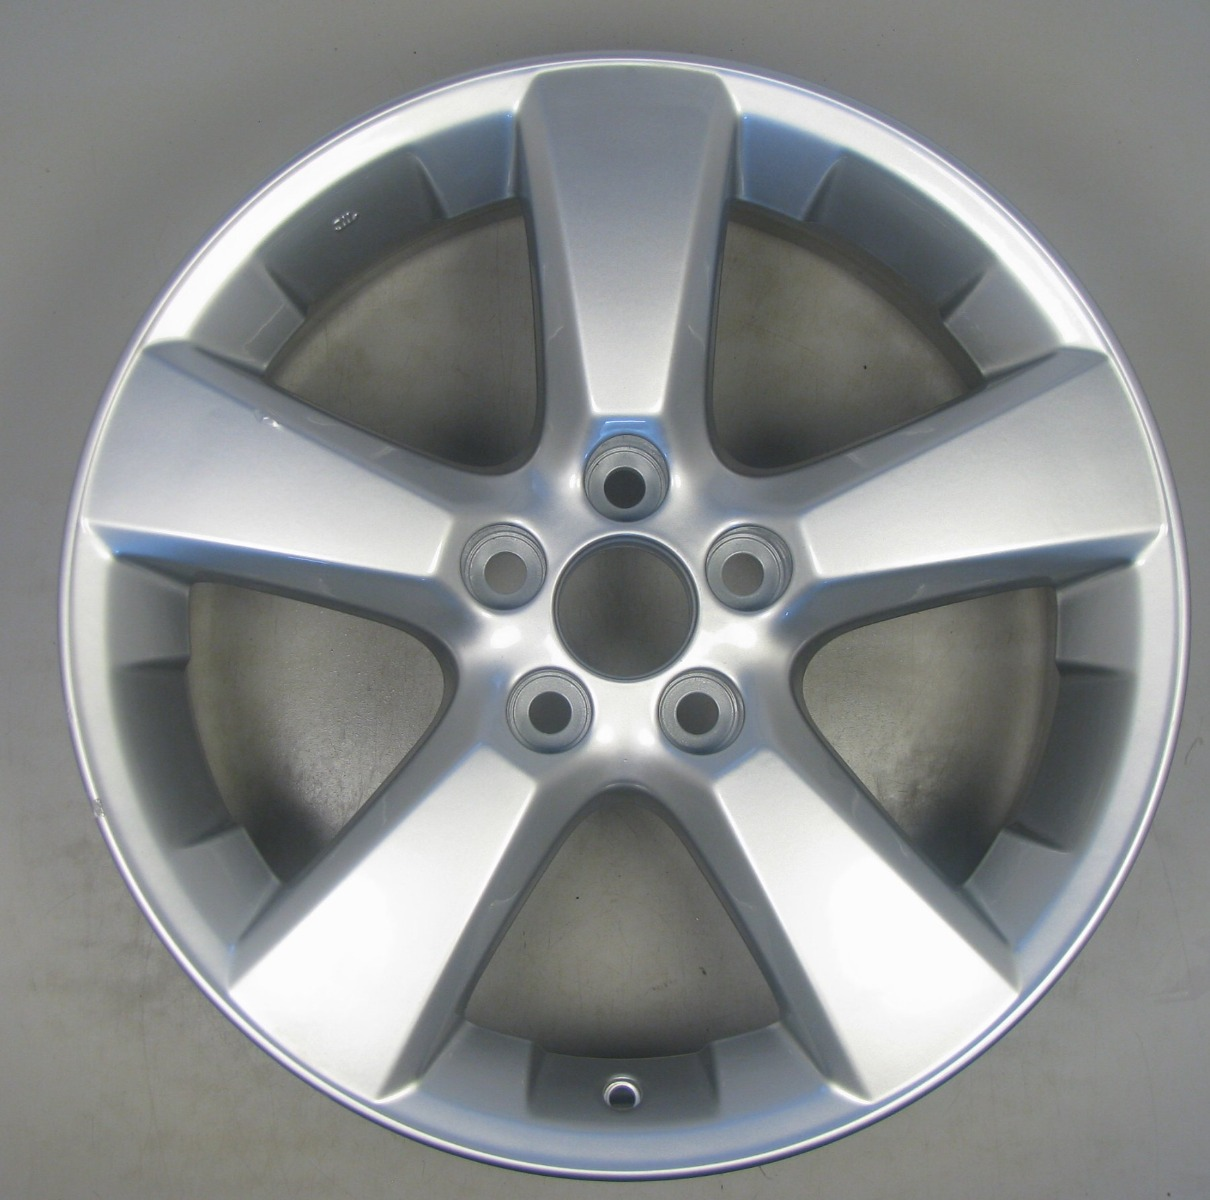 Butzi Chrome Plated Anti Theft Locking Wheel Nut Bolts /& 2 Keys for Fiat Sedici